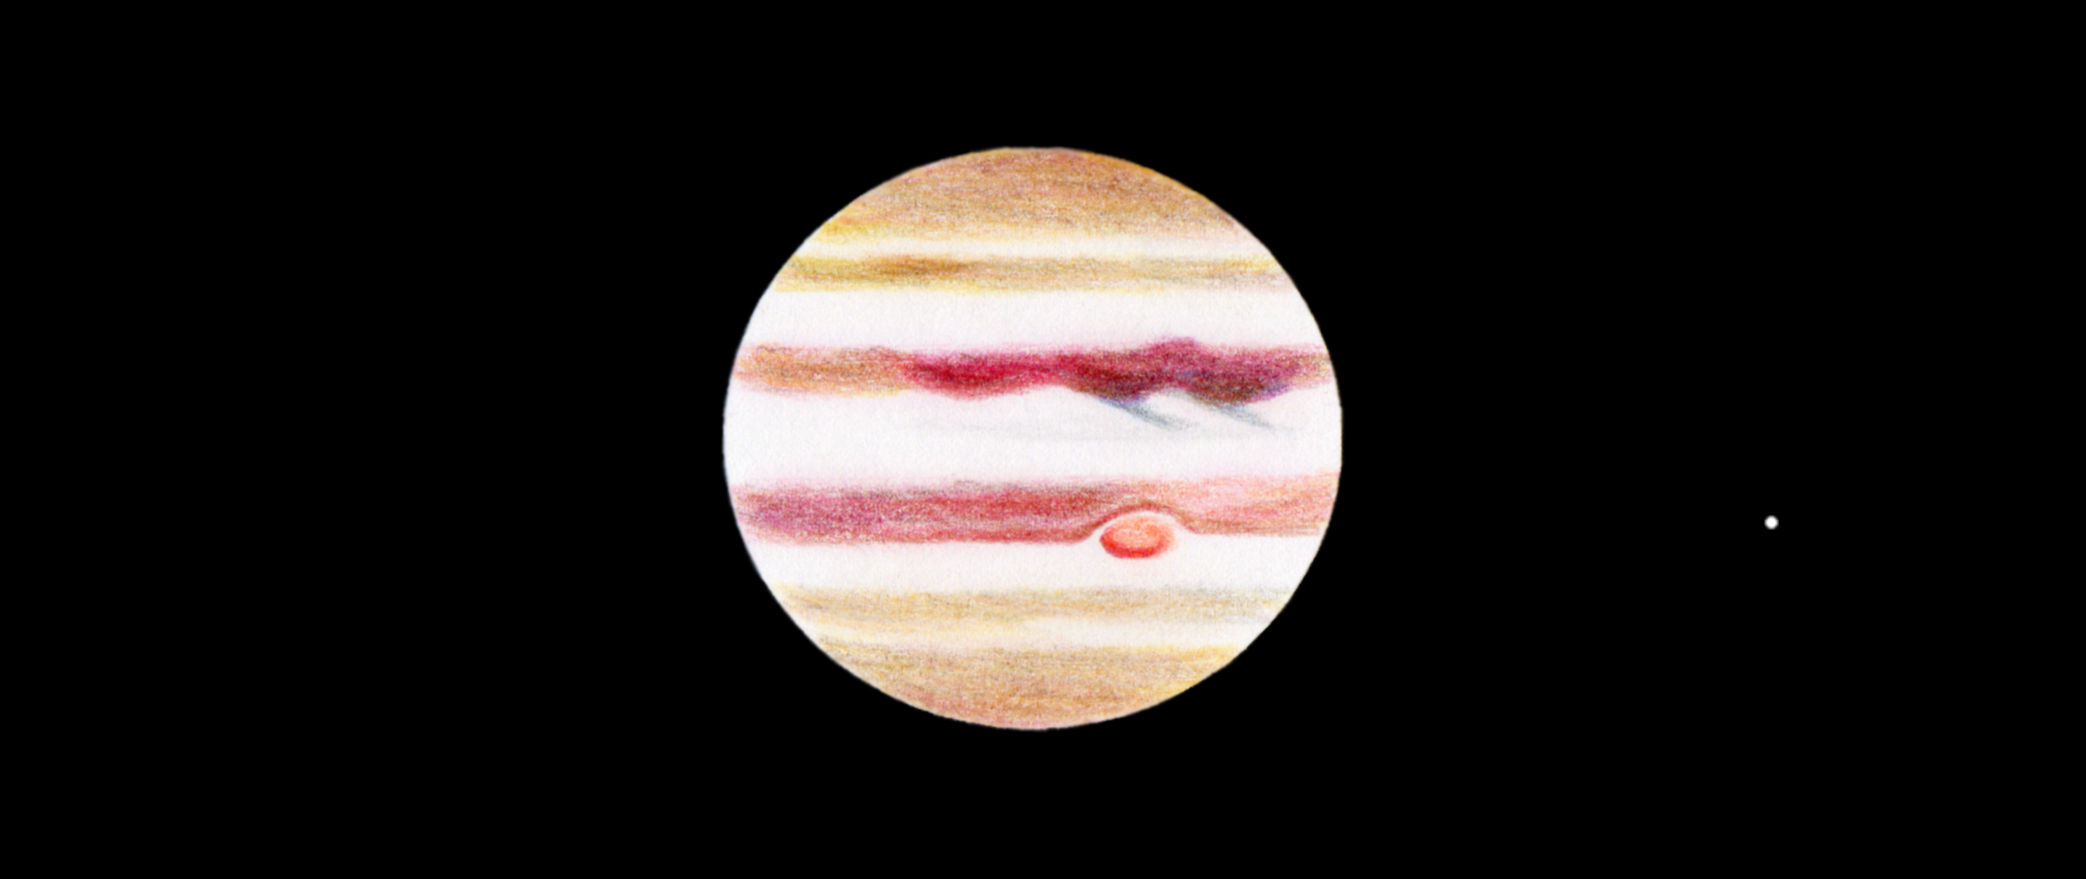 http://ekladata.com/oOzPCaHKYNRVAk-HcFNUGV3qKwc/Jupiter-23-02-2016-L80-23h30.png